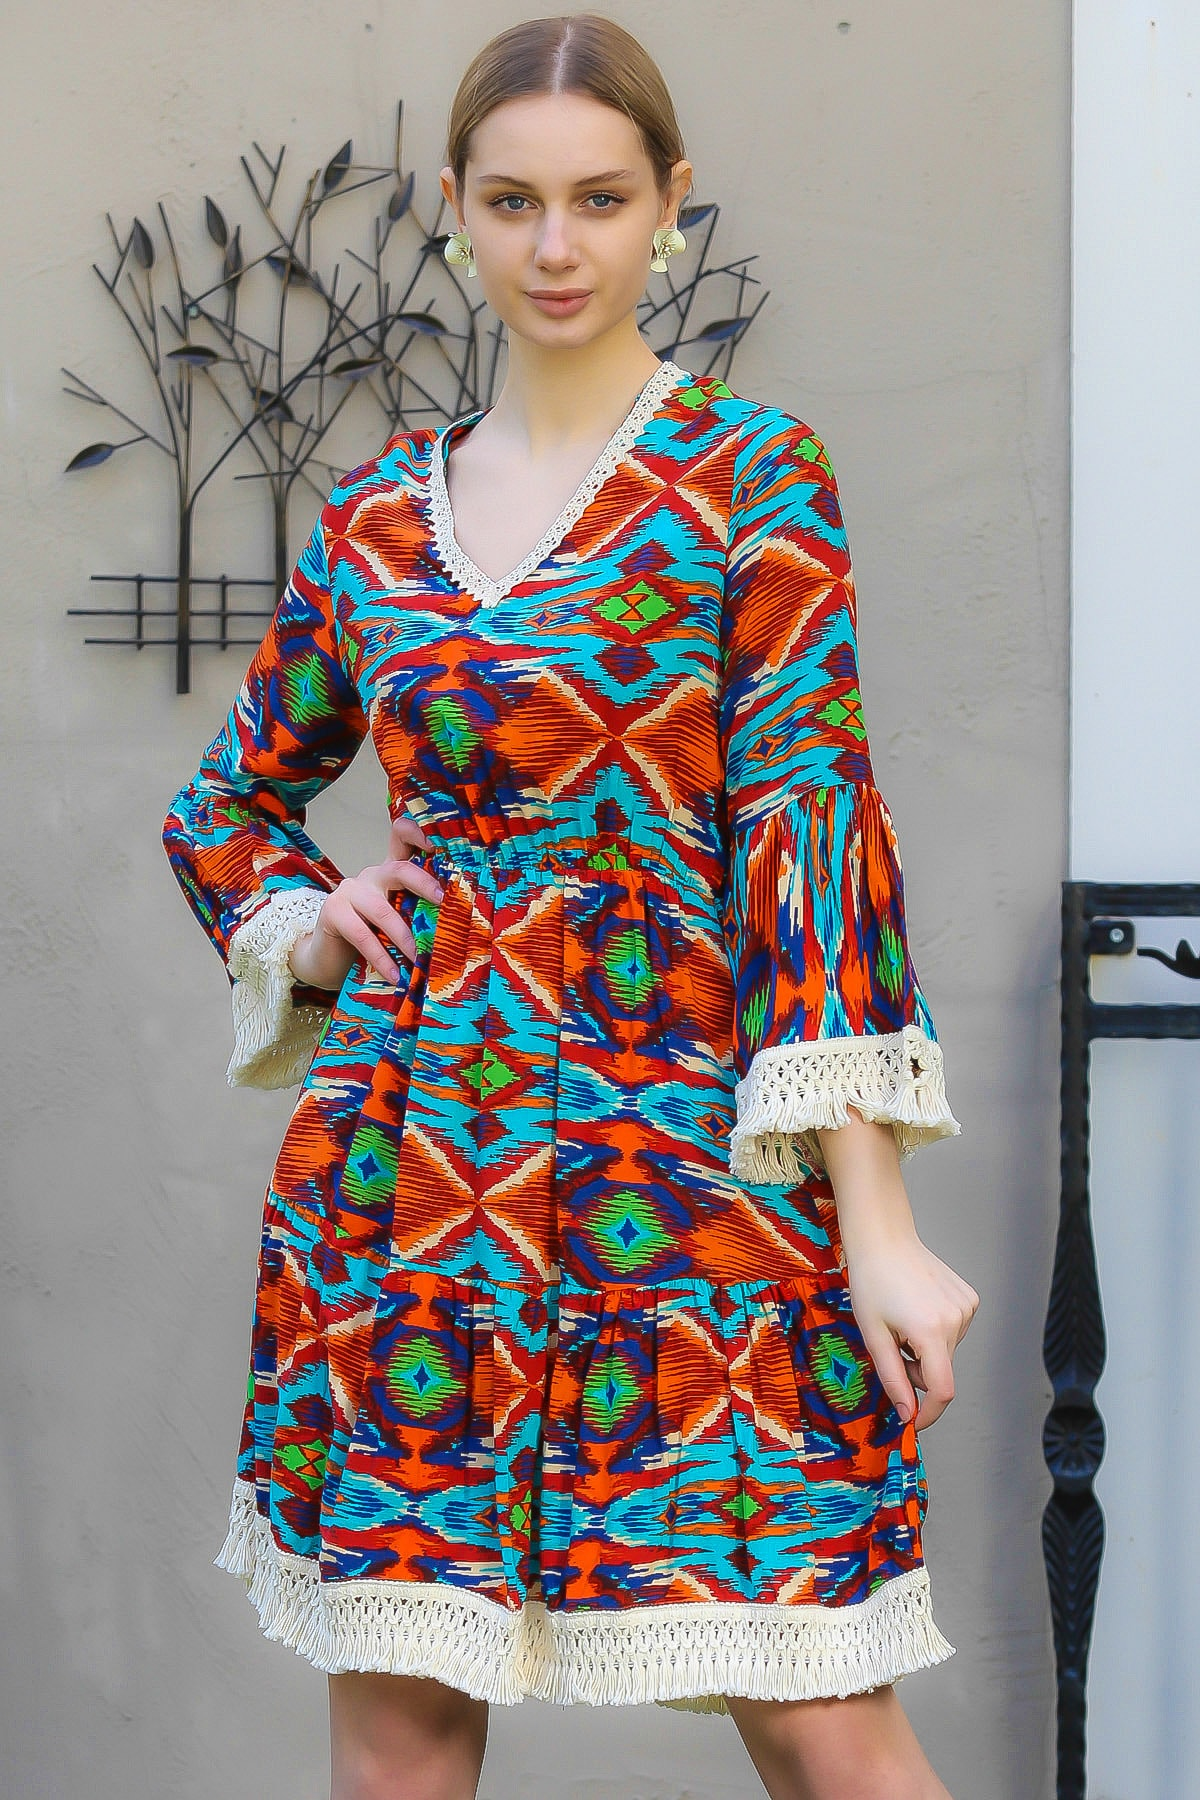 Chiccy Kadın Kiremit V Yaka Tribal Desenli Dantelli Dokuma Mini Elbise M10160000EL95007